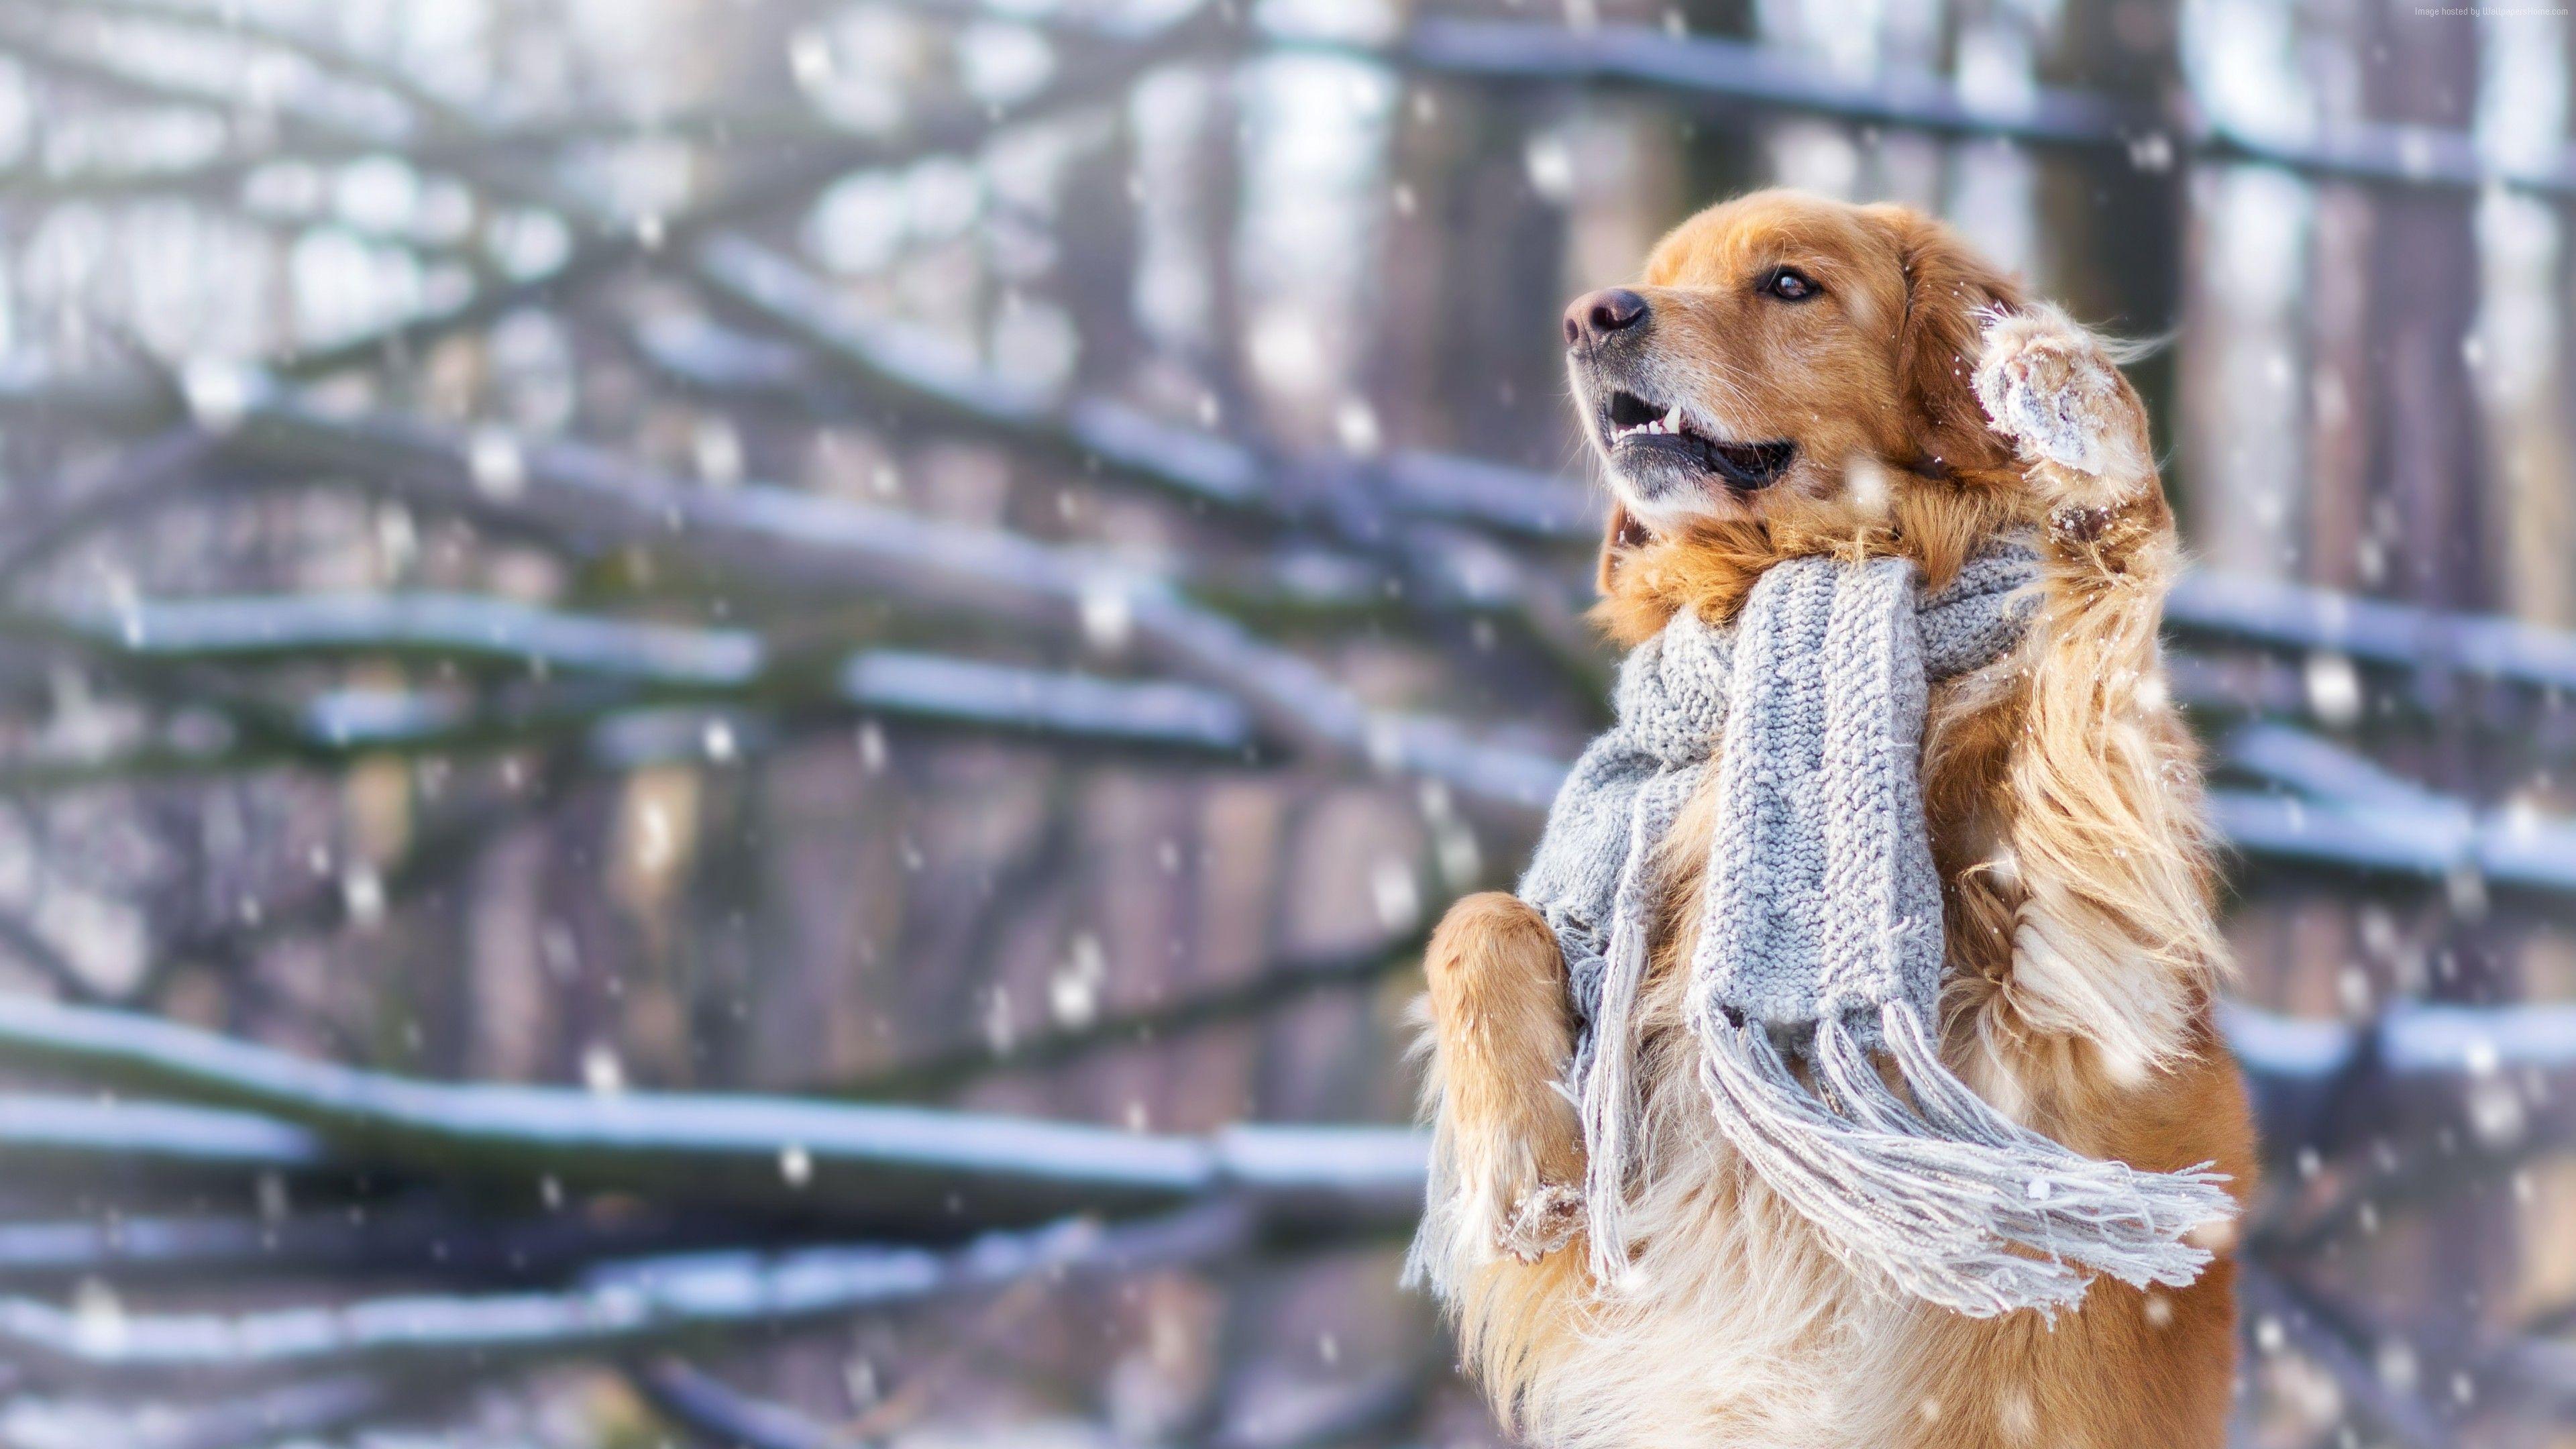 Wallpaper dog, cute animals, snow, winter, 4k, Animals